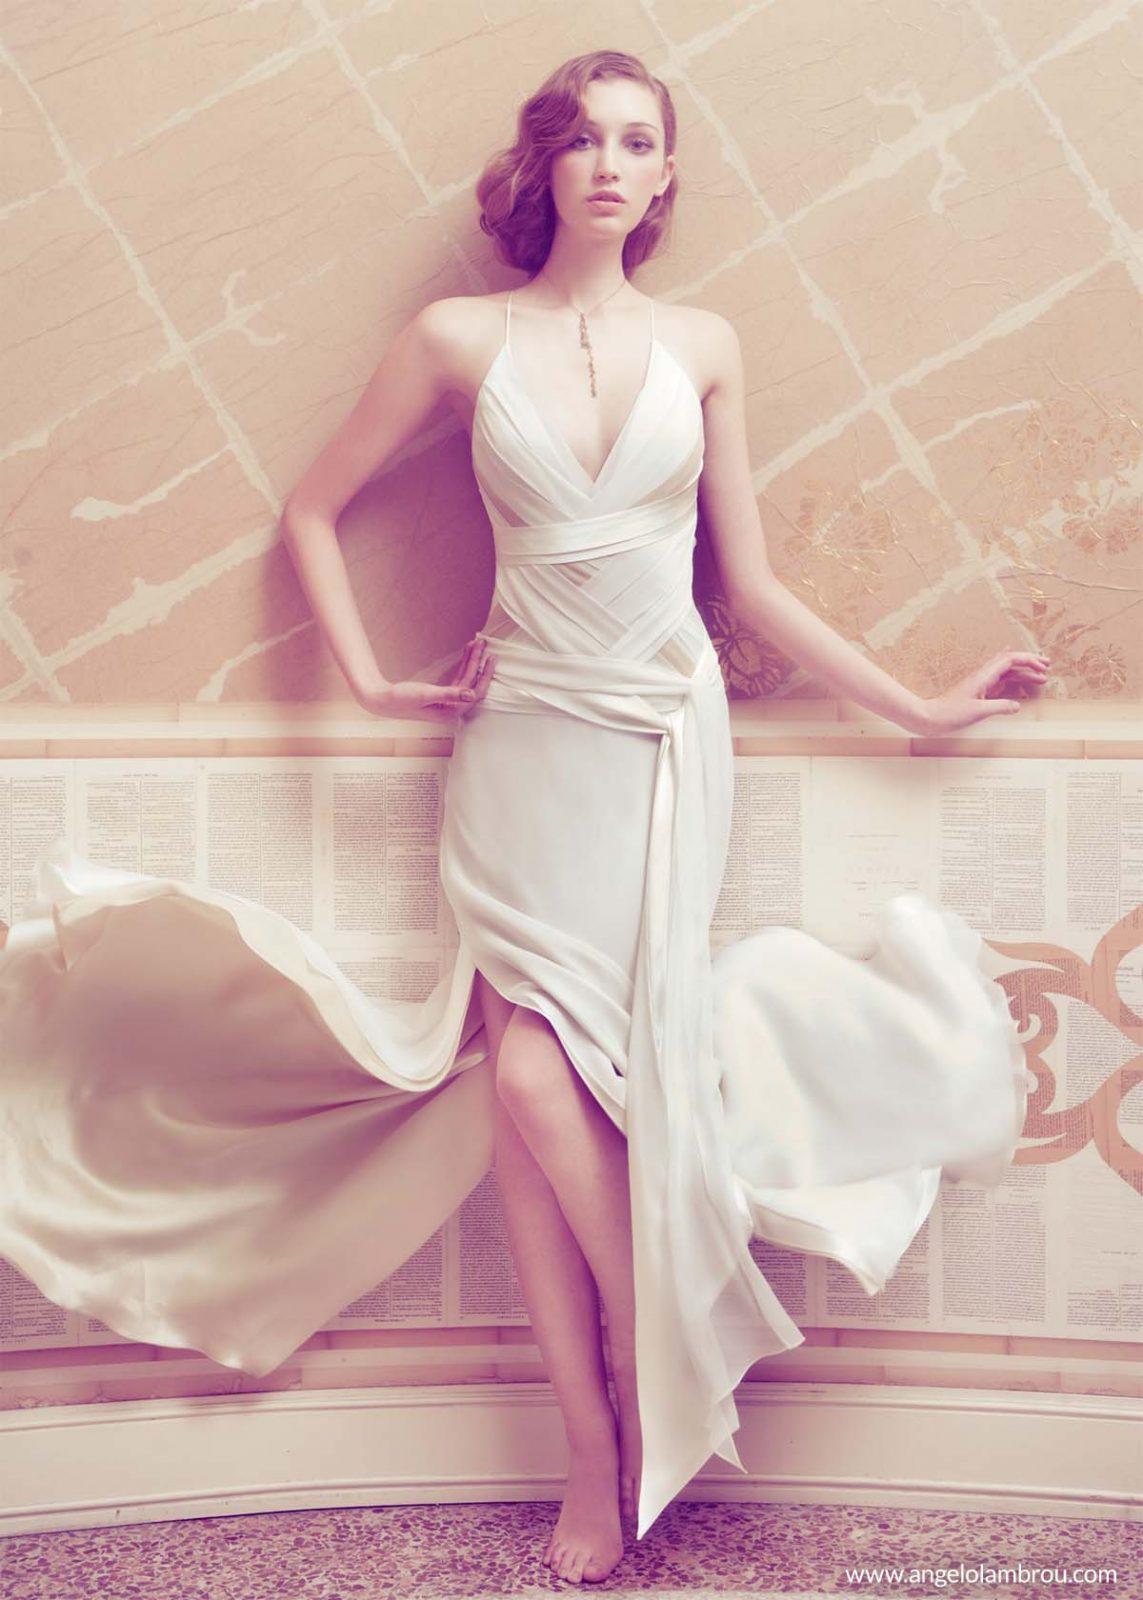 Wedding Dress Aurora By Angelo Lambrou